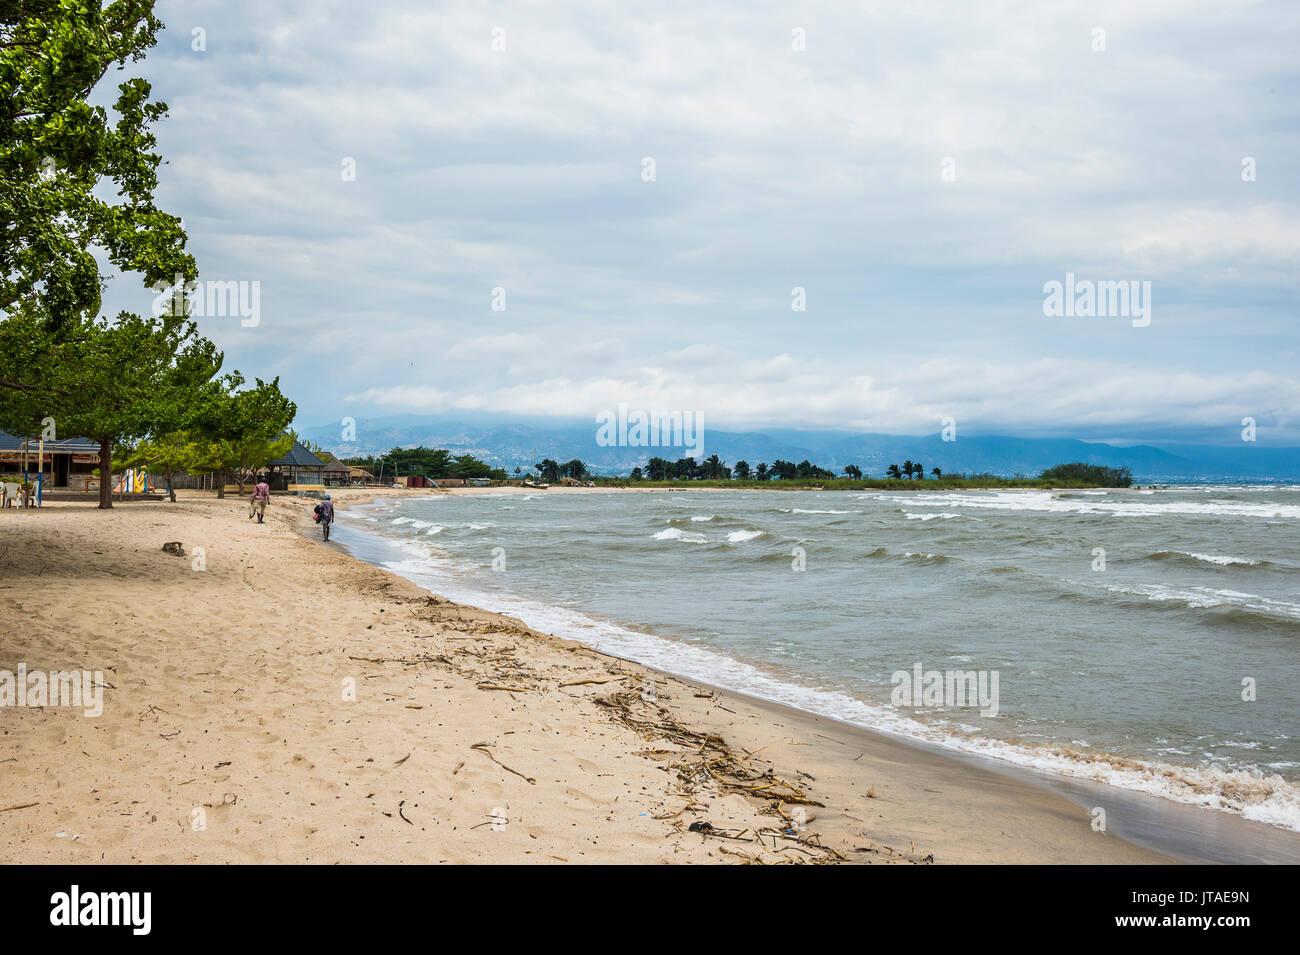 Beach on the shores of Lake Tanganyika, Bujumbura, Burundi, Africa - Stock Image